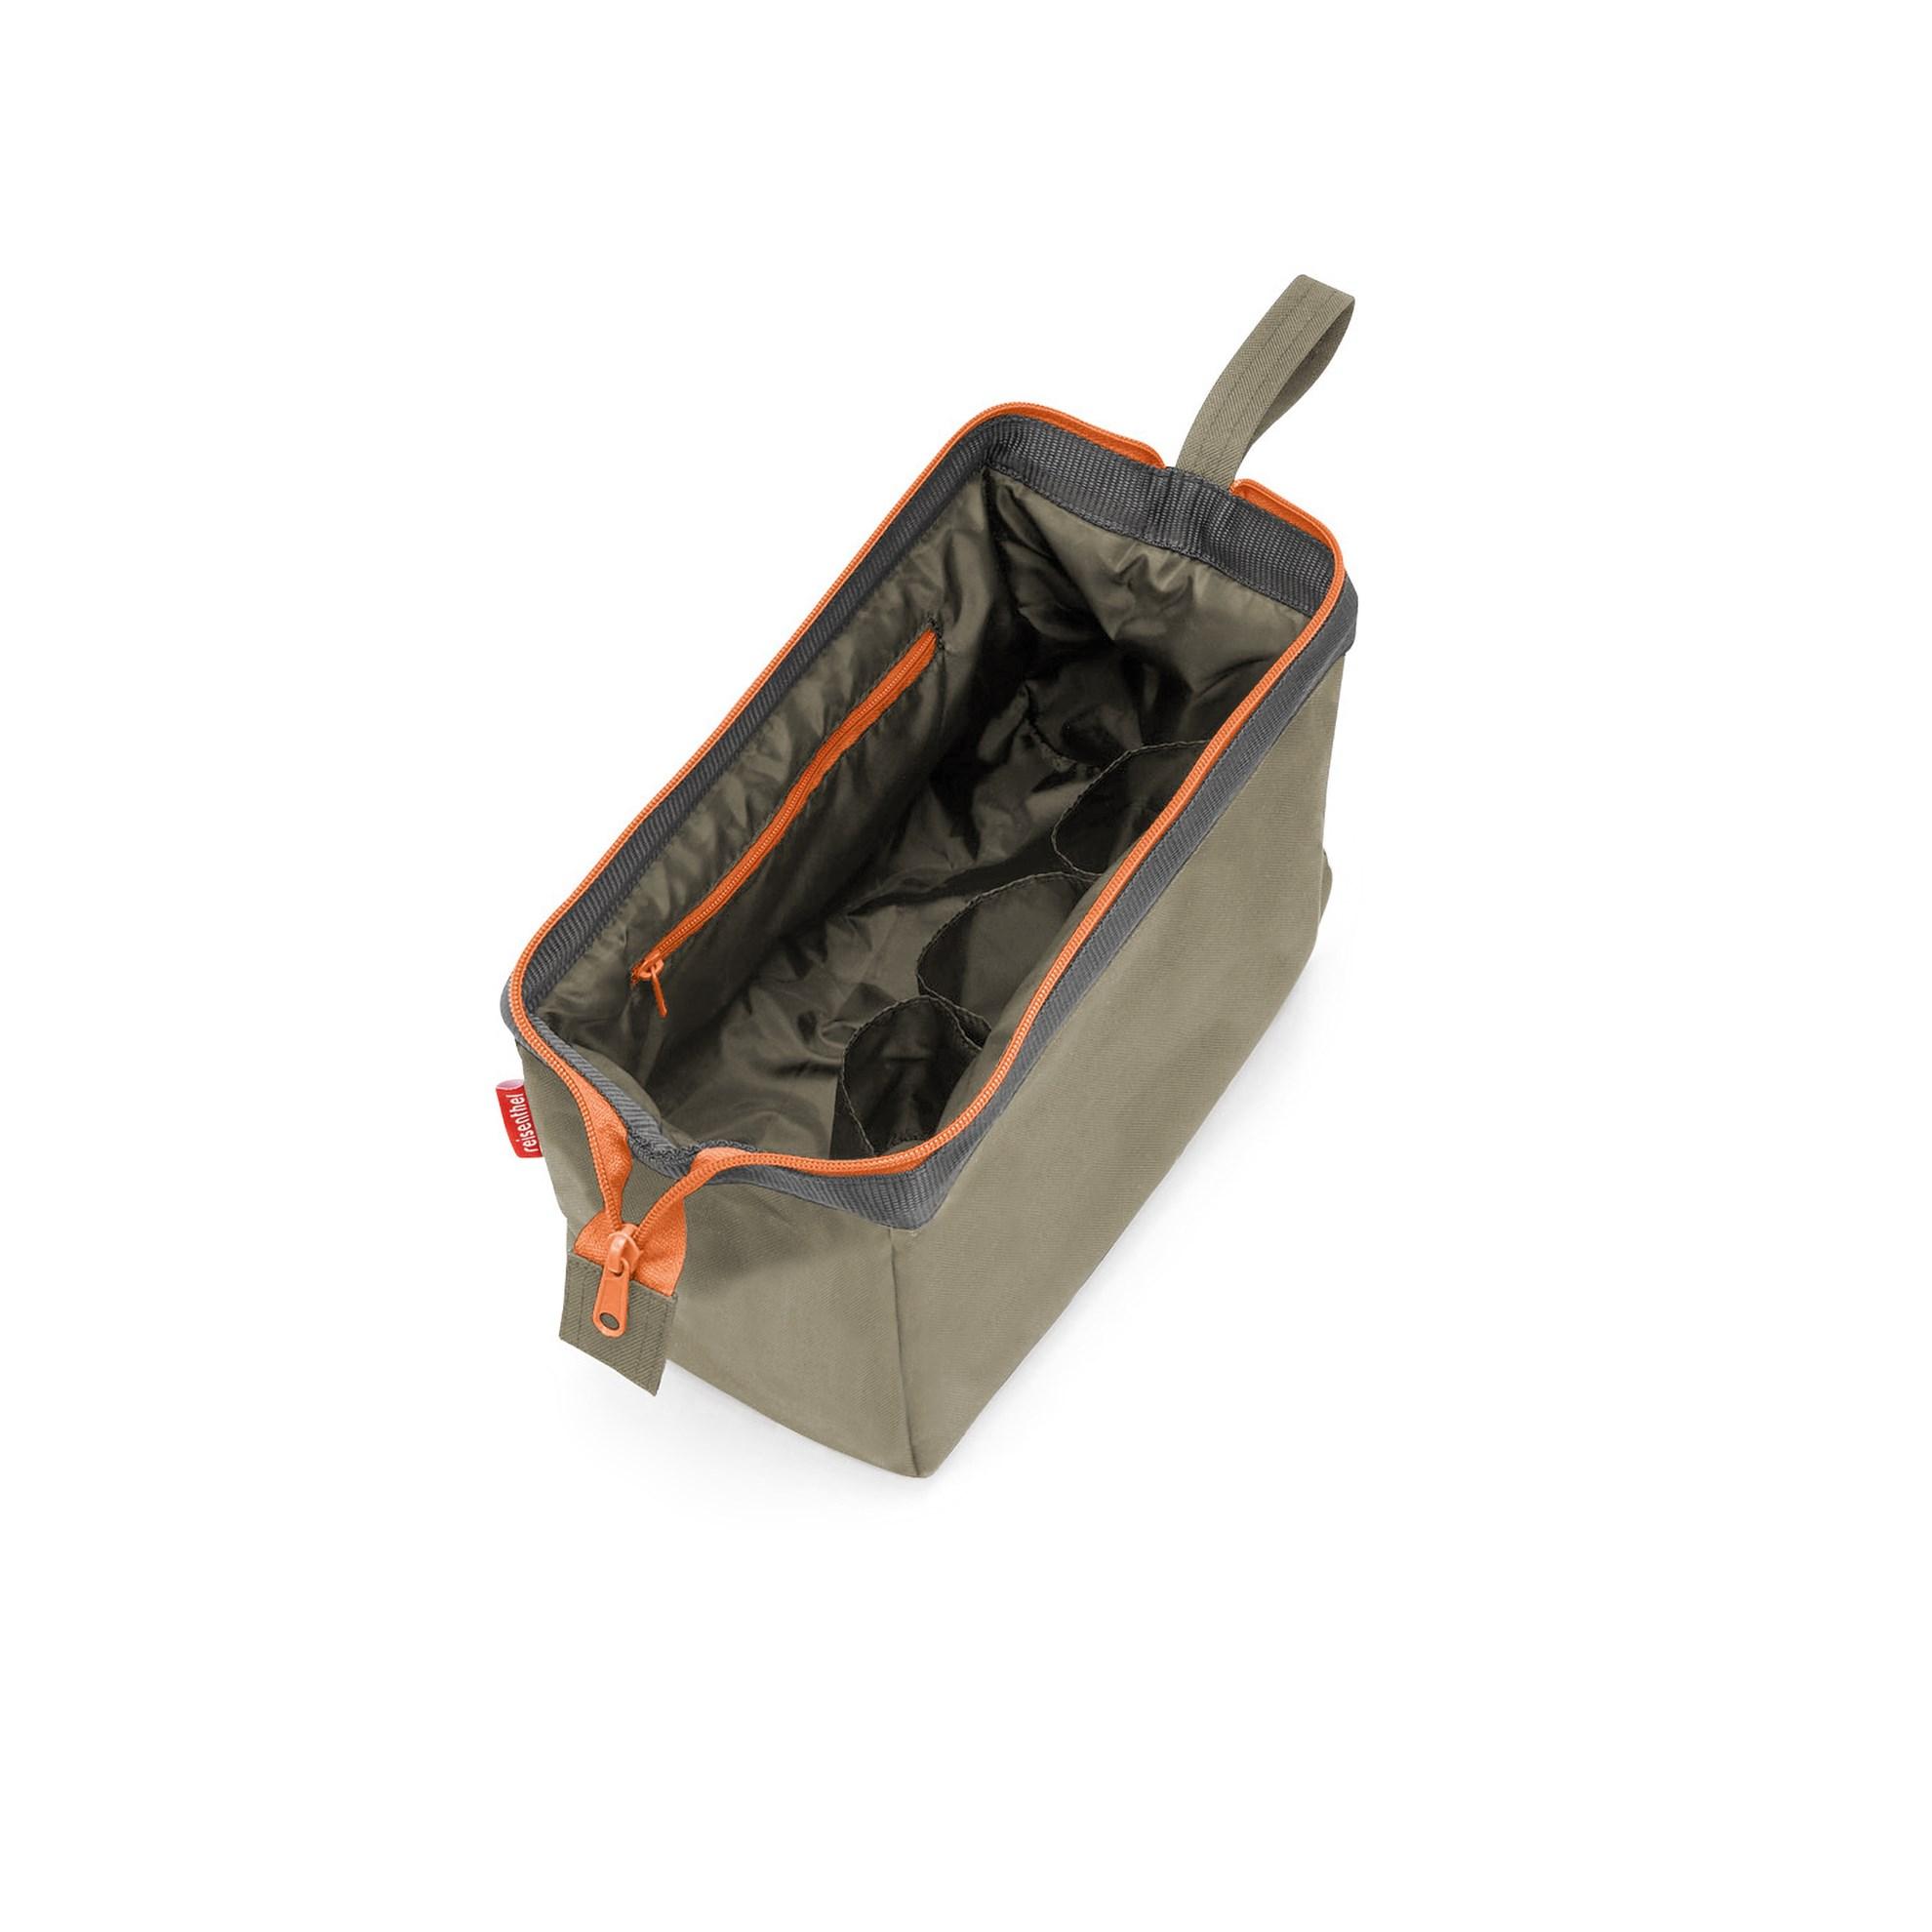 Kosmetická taška Travelcosmetic olive green_2